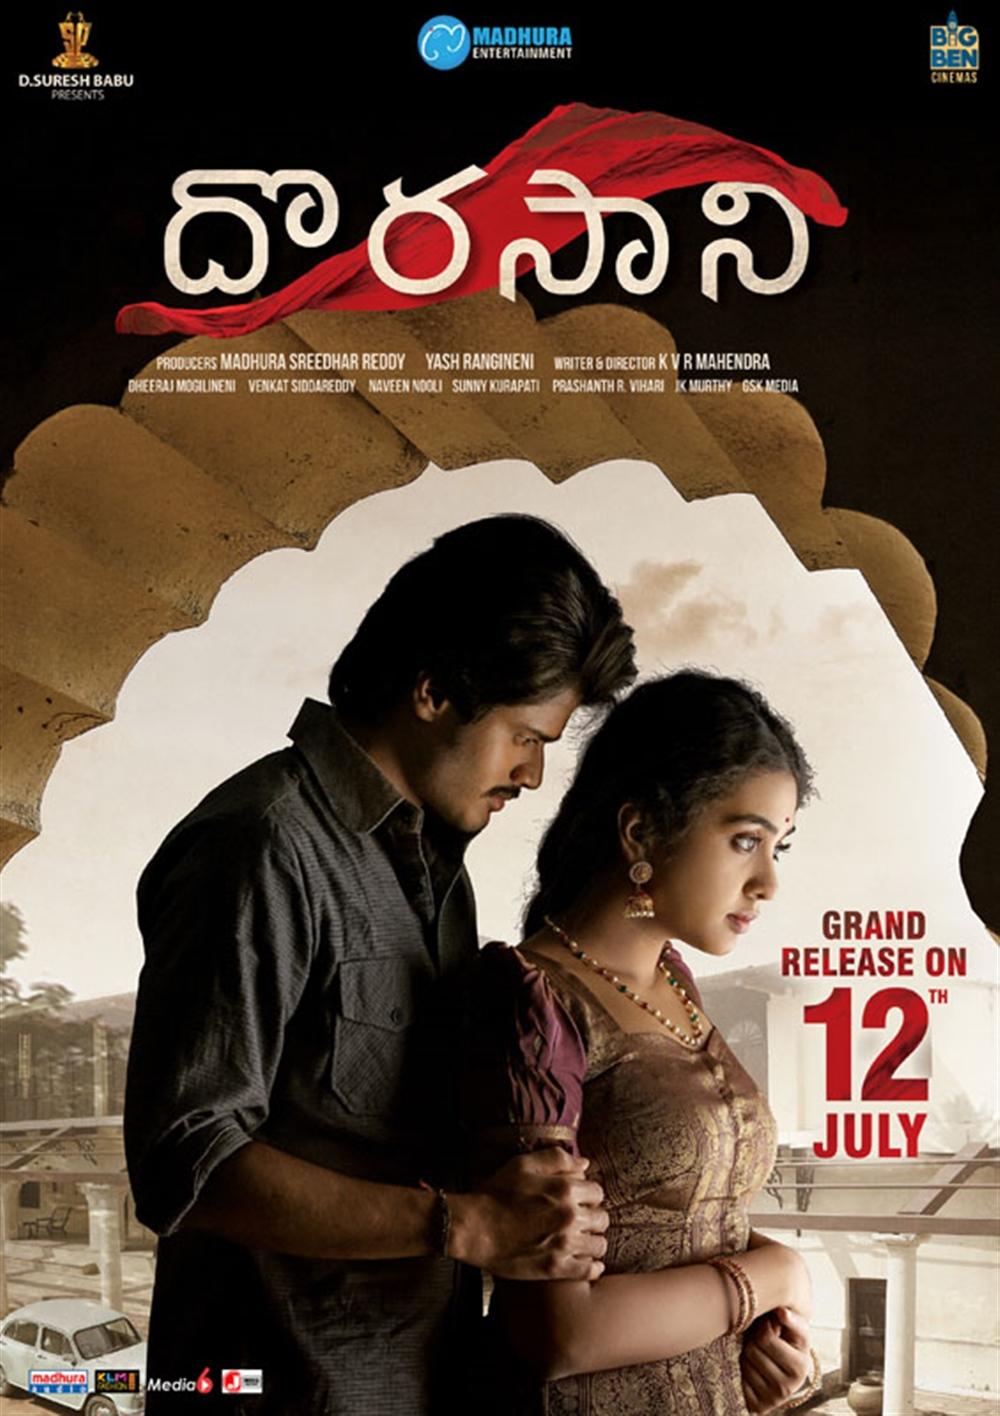 Anand Deverakonda, Shivathmika Rajashekar in Dorasani Movie Release on July 12th Posters